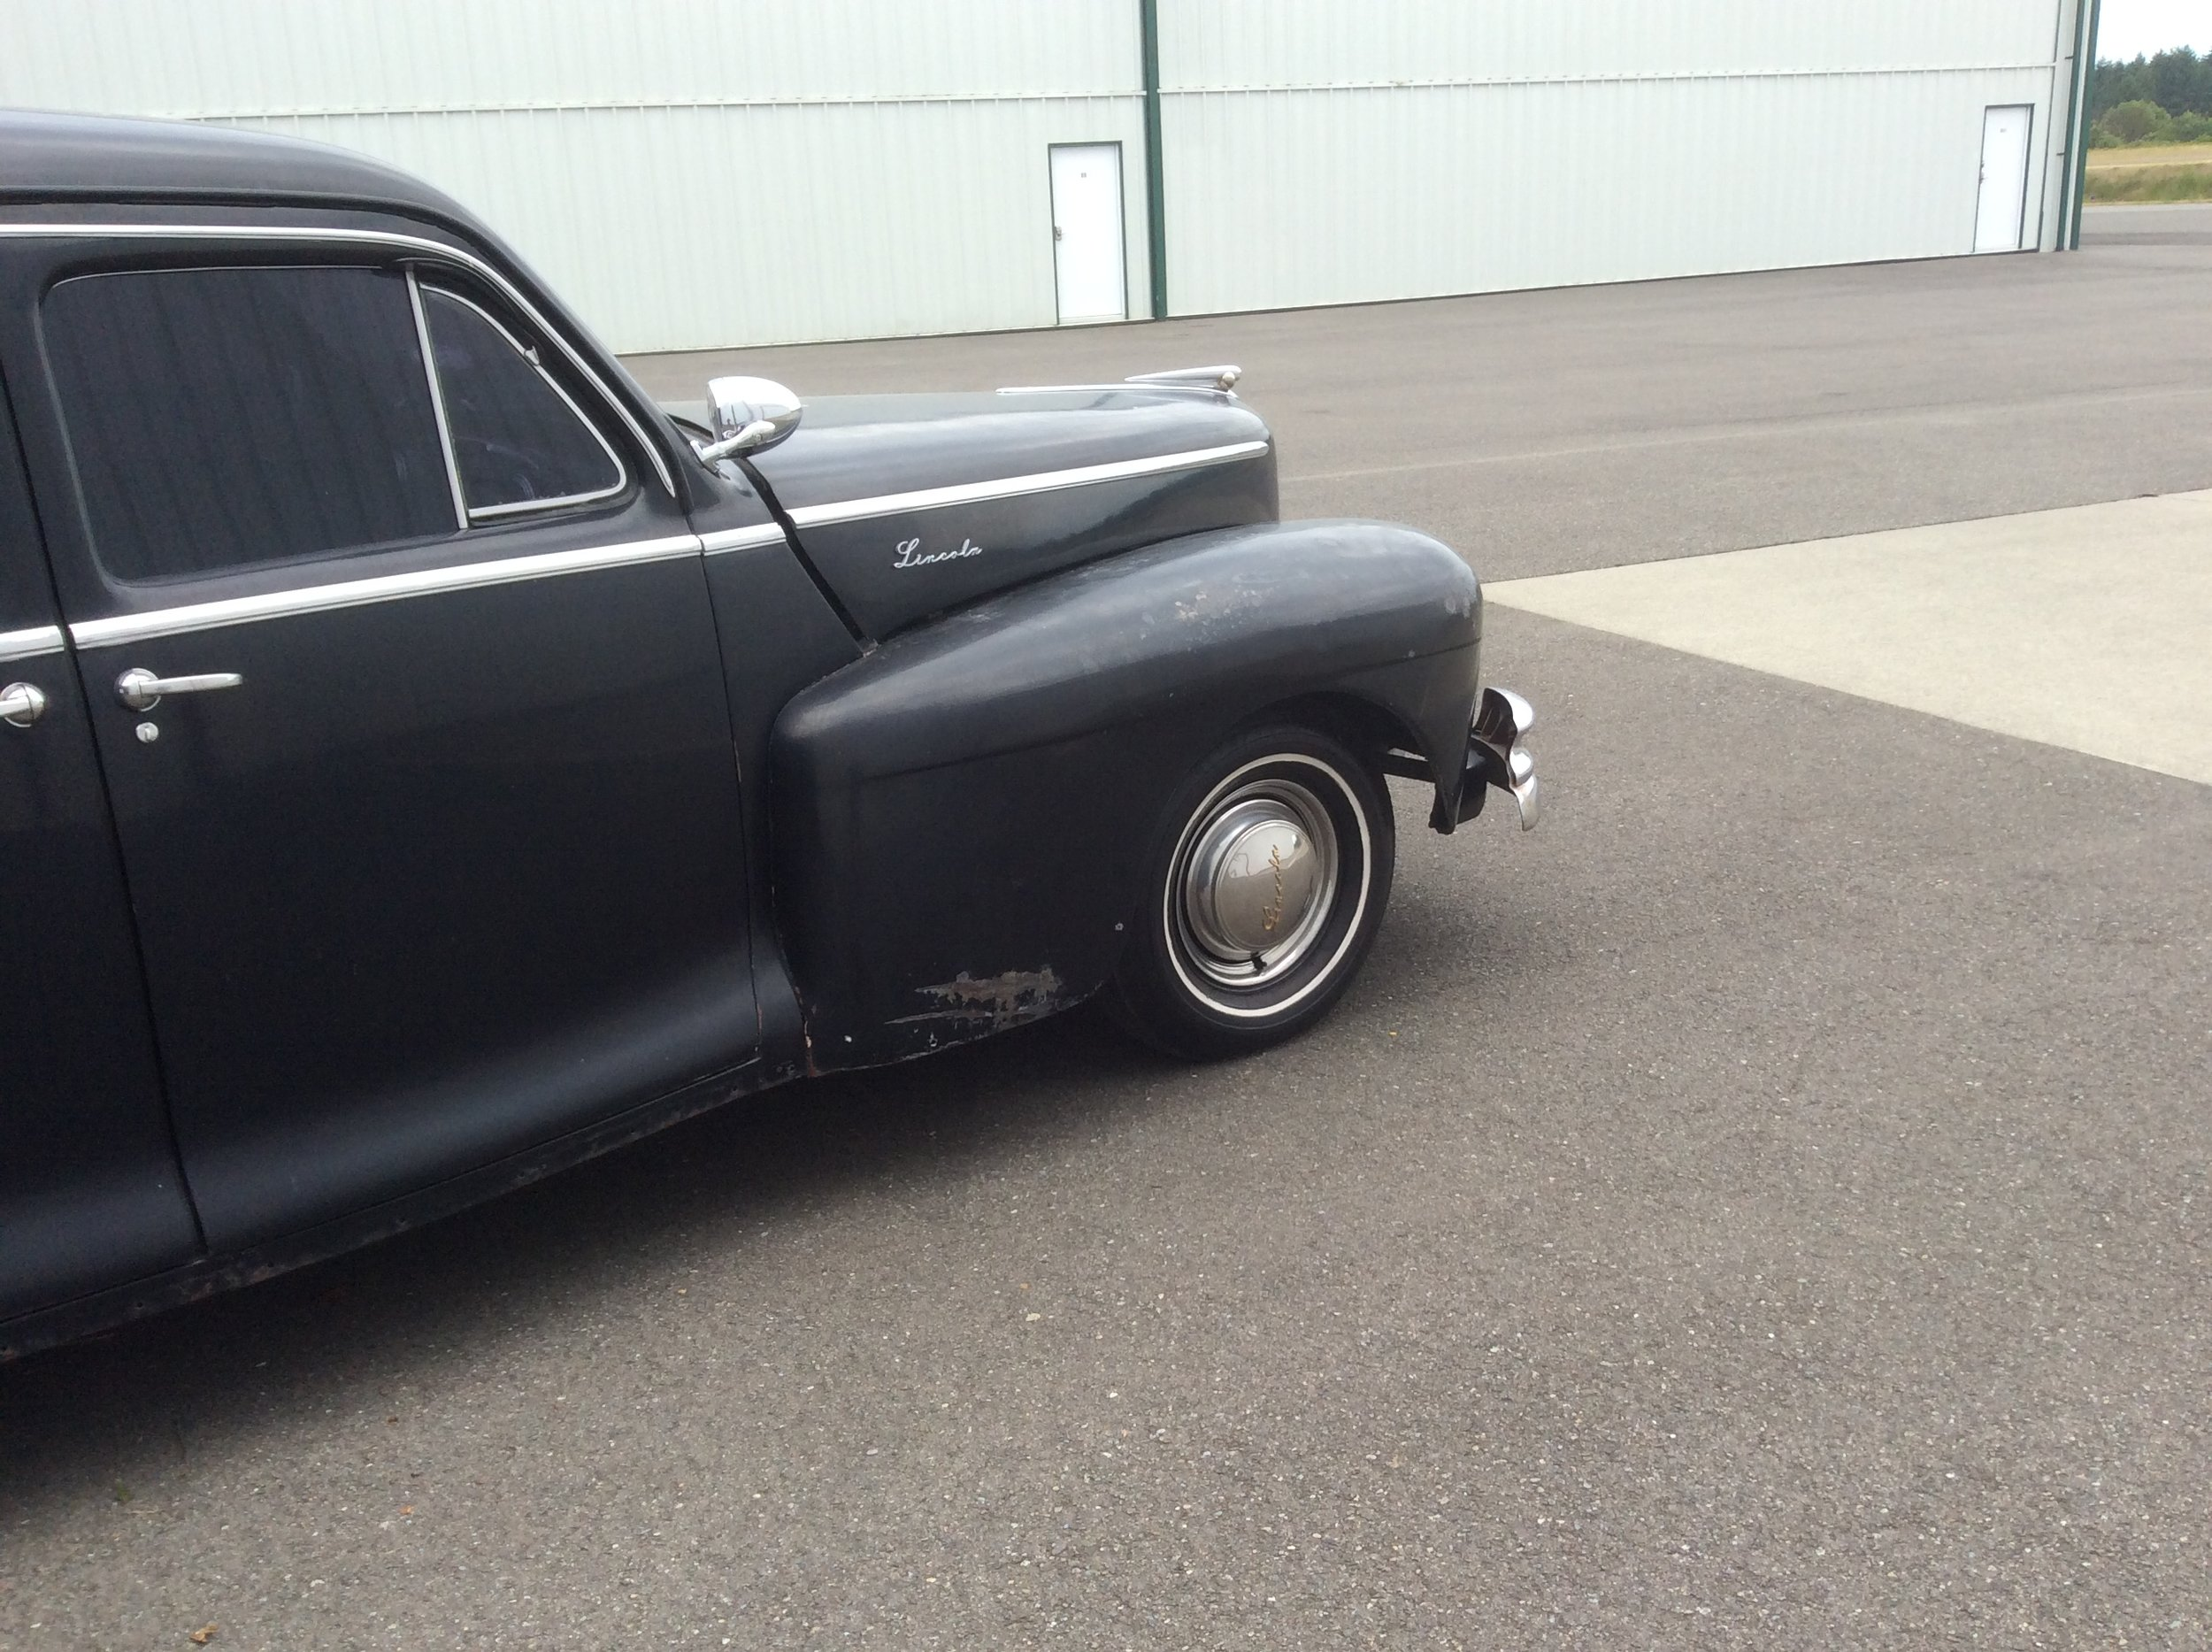 1948 Lincoln Zephyr (242).JPG